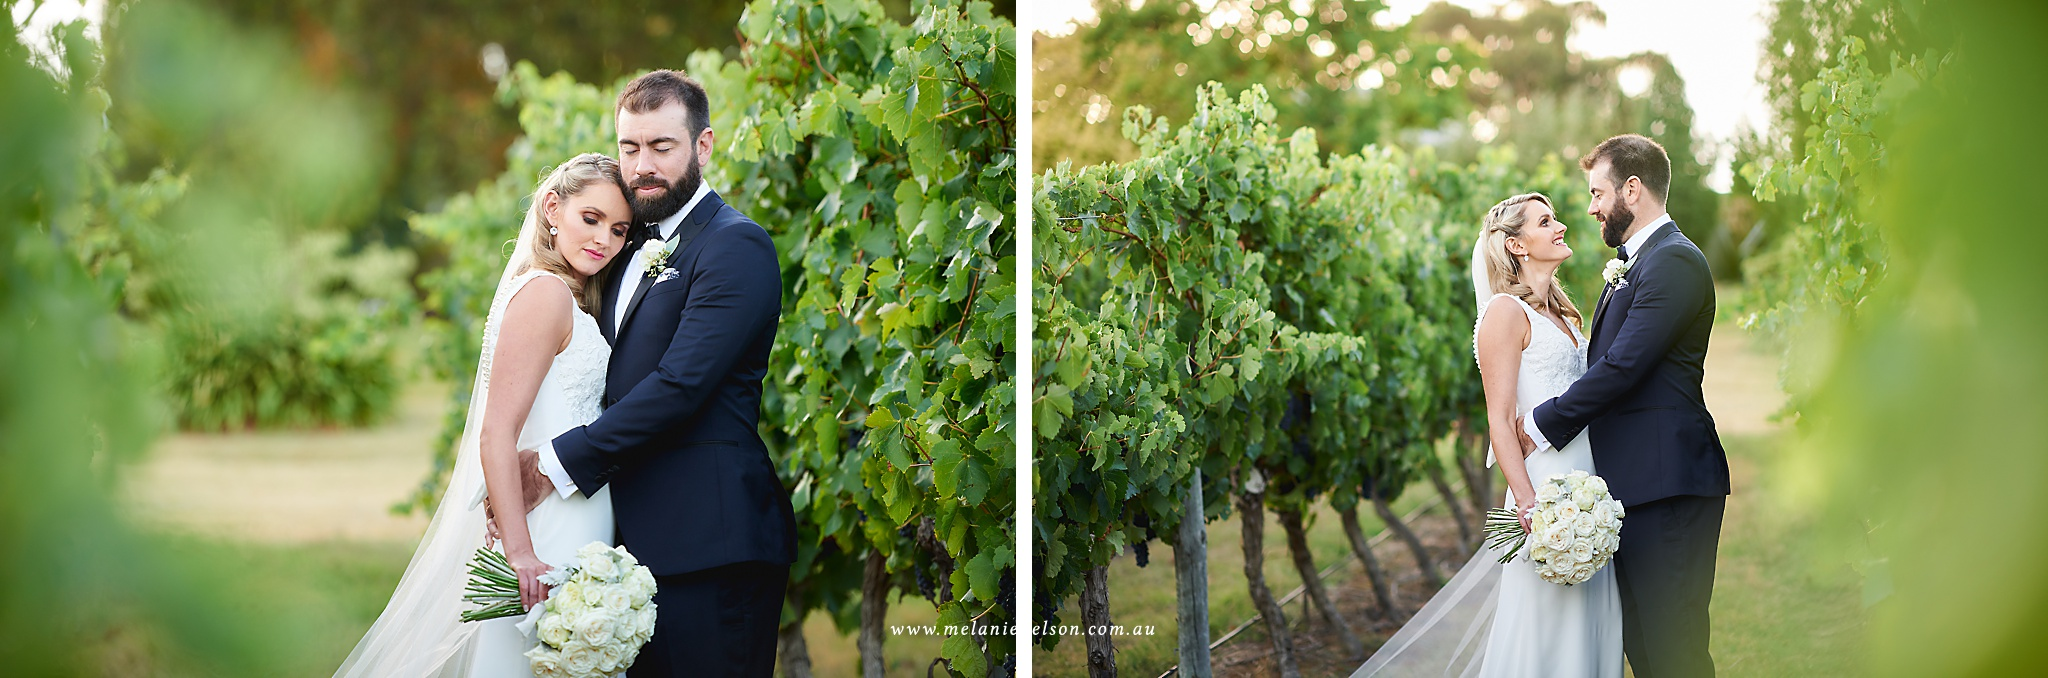 longview_vineyard_wedding_0074.jpg